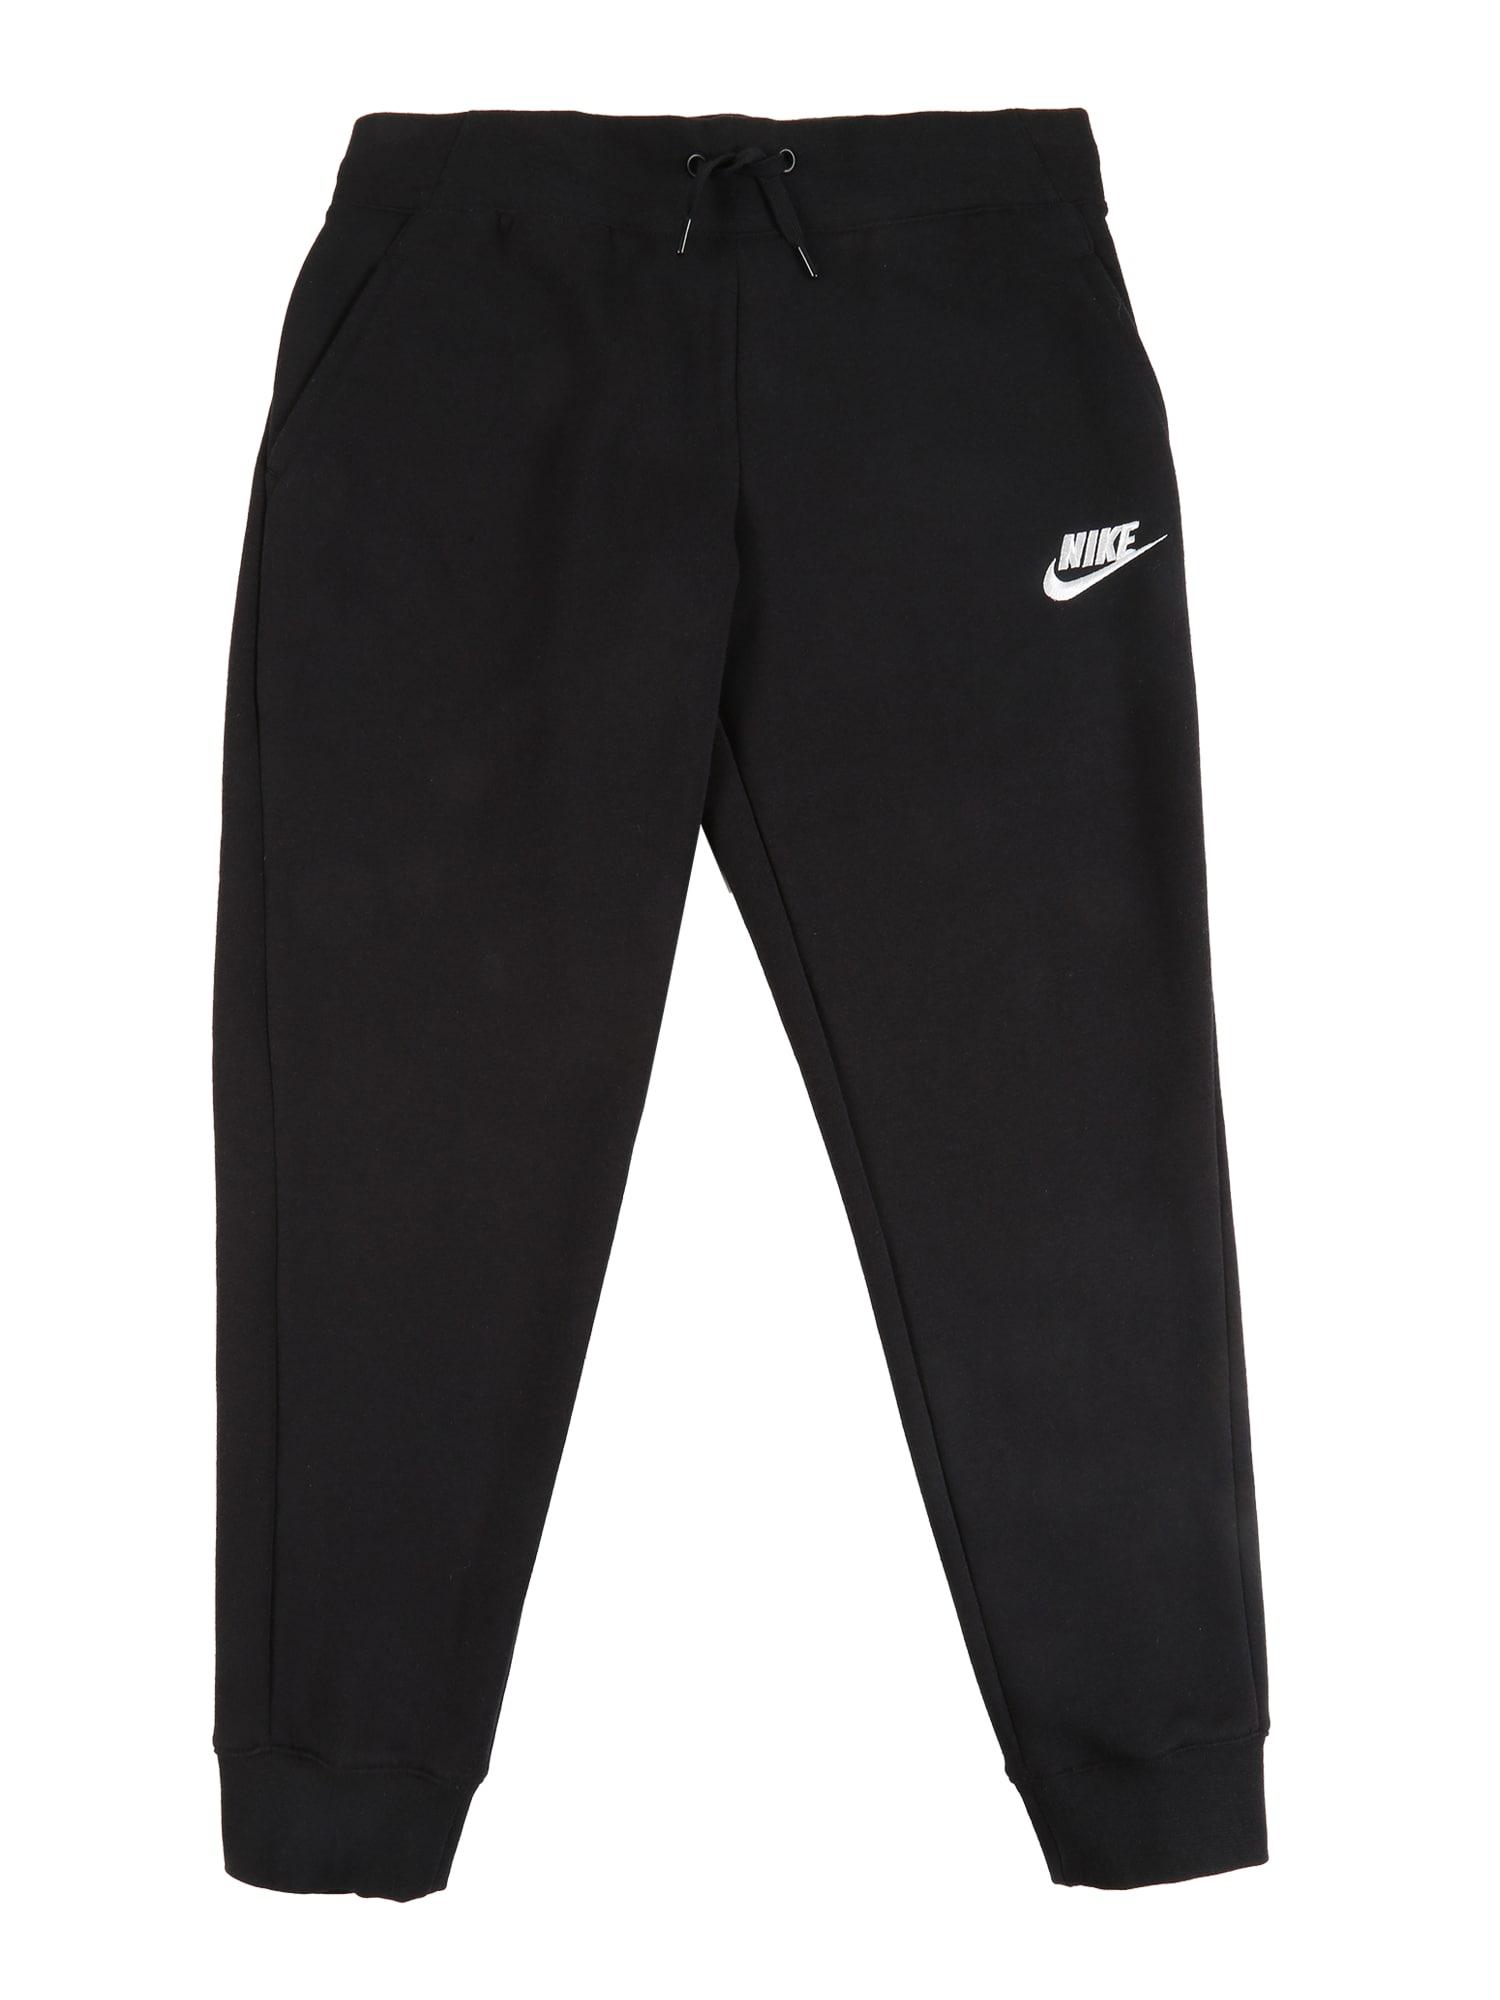 Nike Sportswear Kelnės juoda / balta